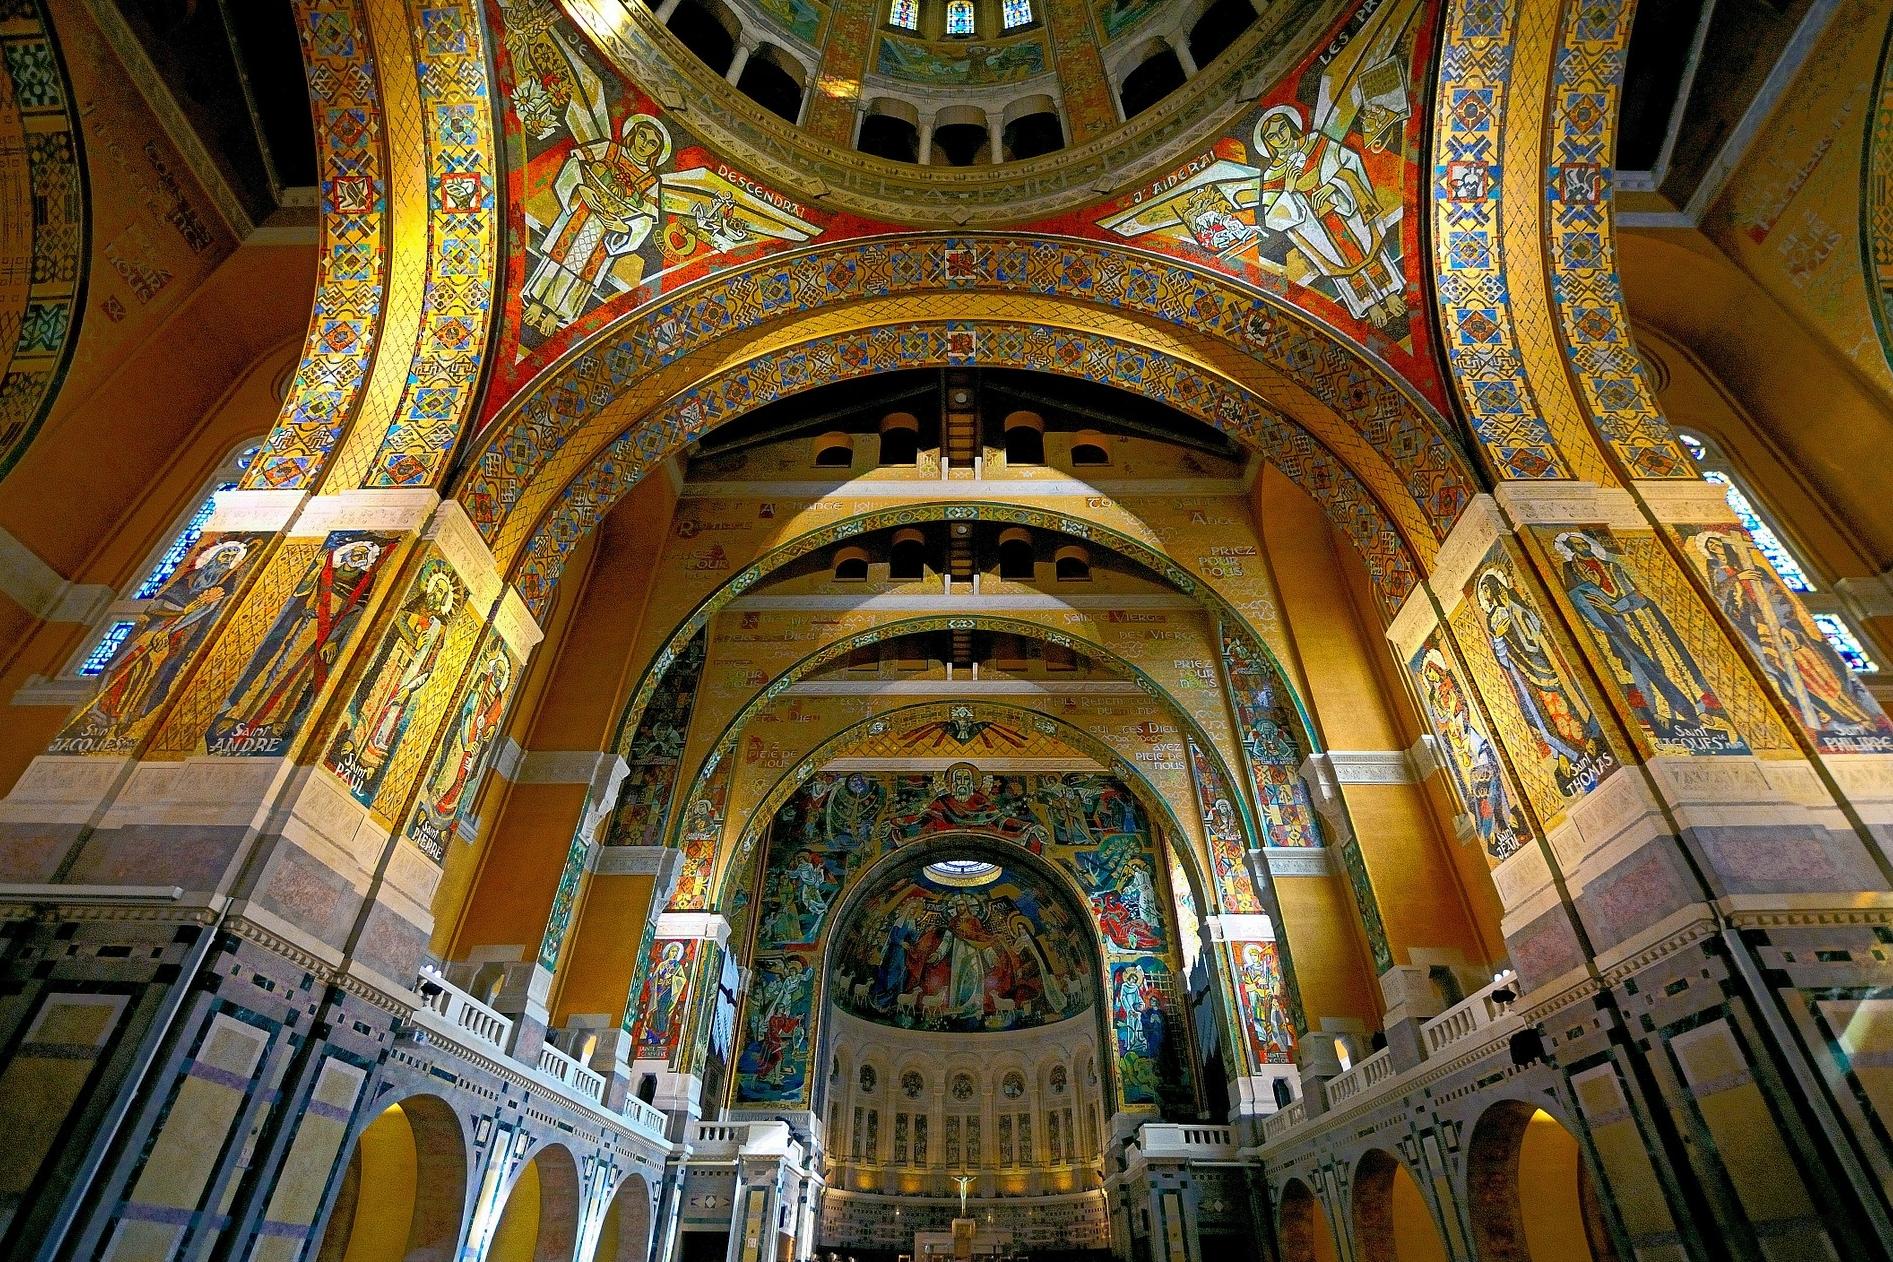 The Basilica of St. Thérèse